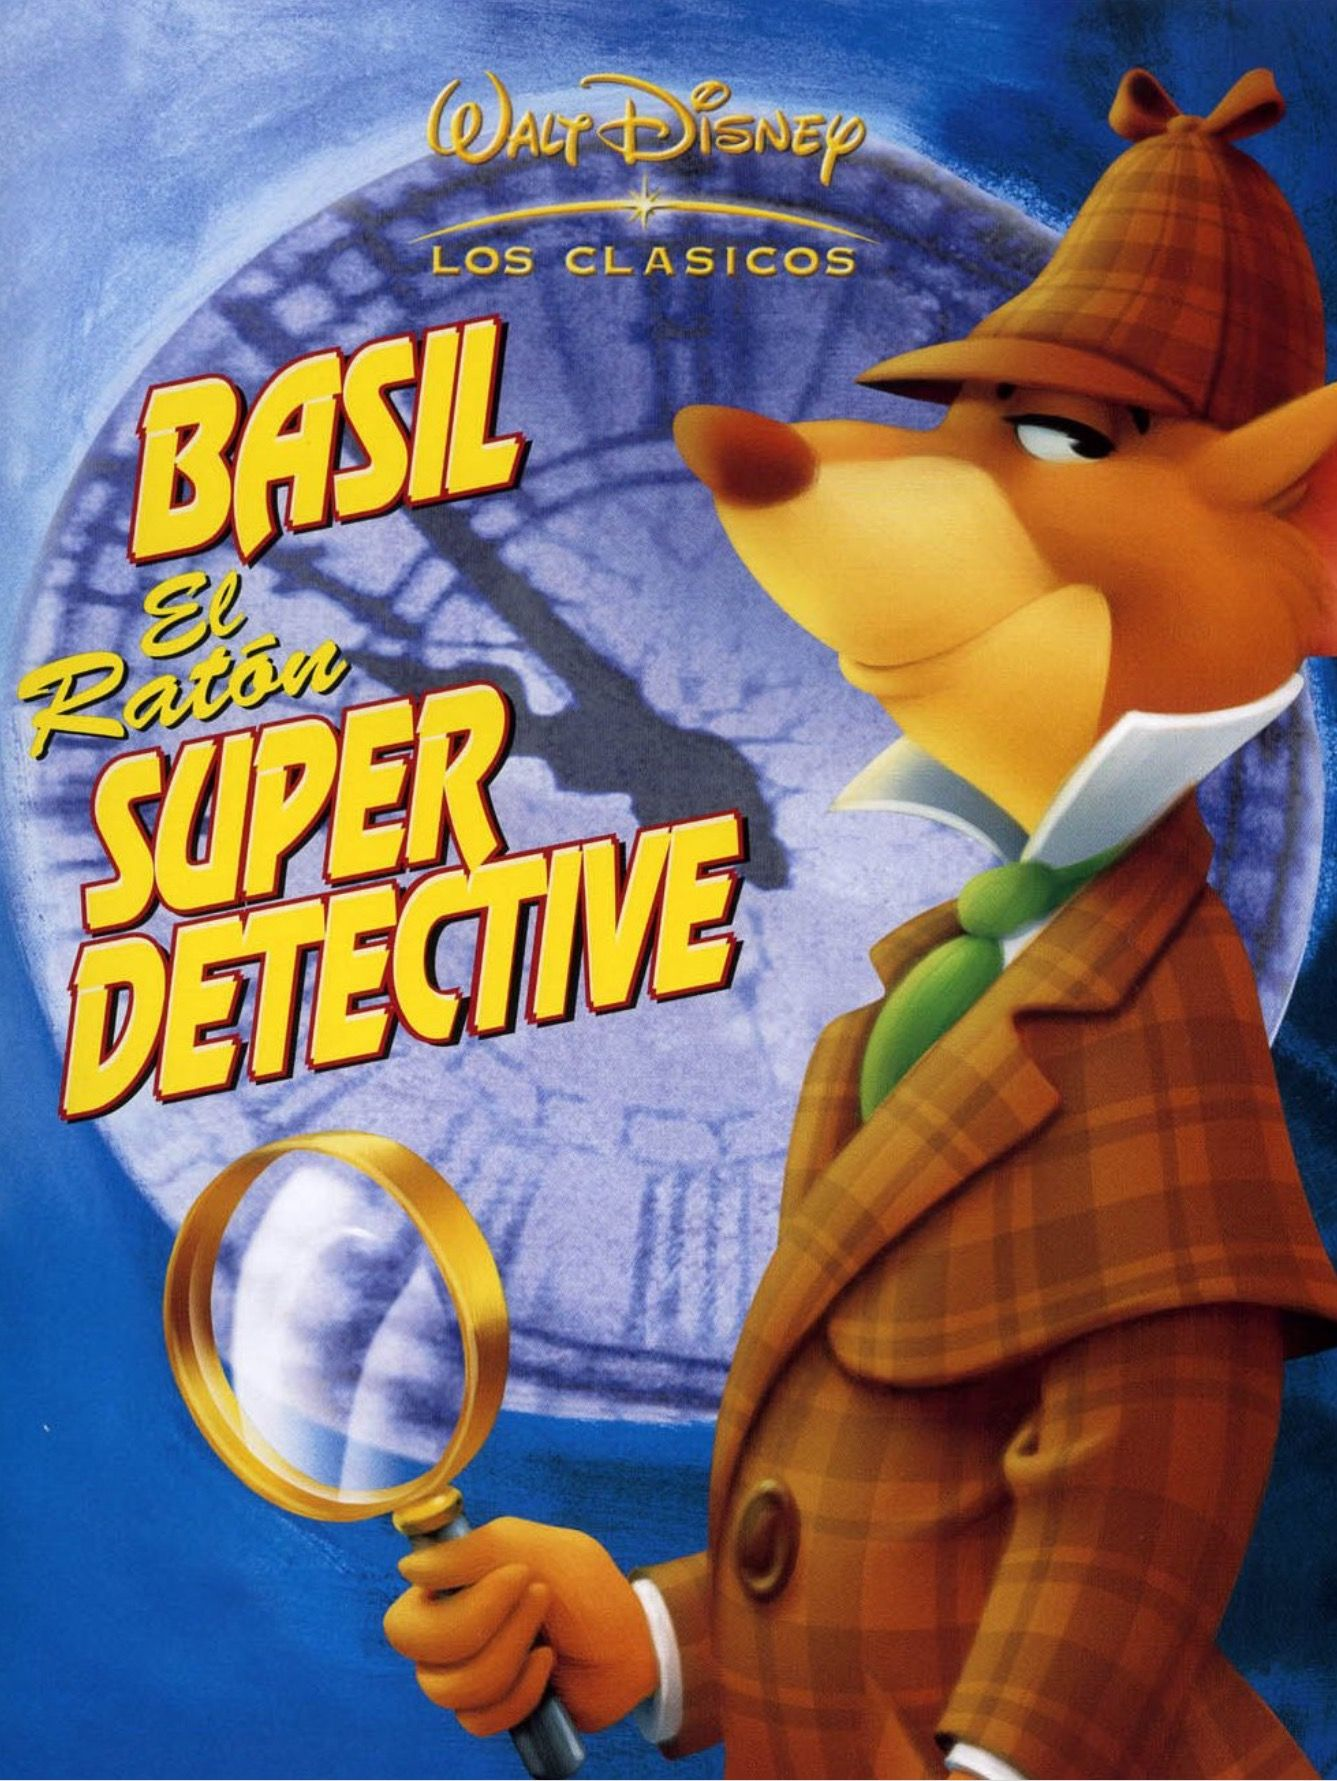 Basil El Ratón Superdetective The Great Mouse Detective 1986